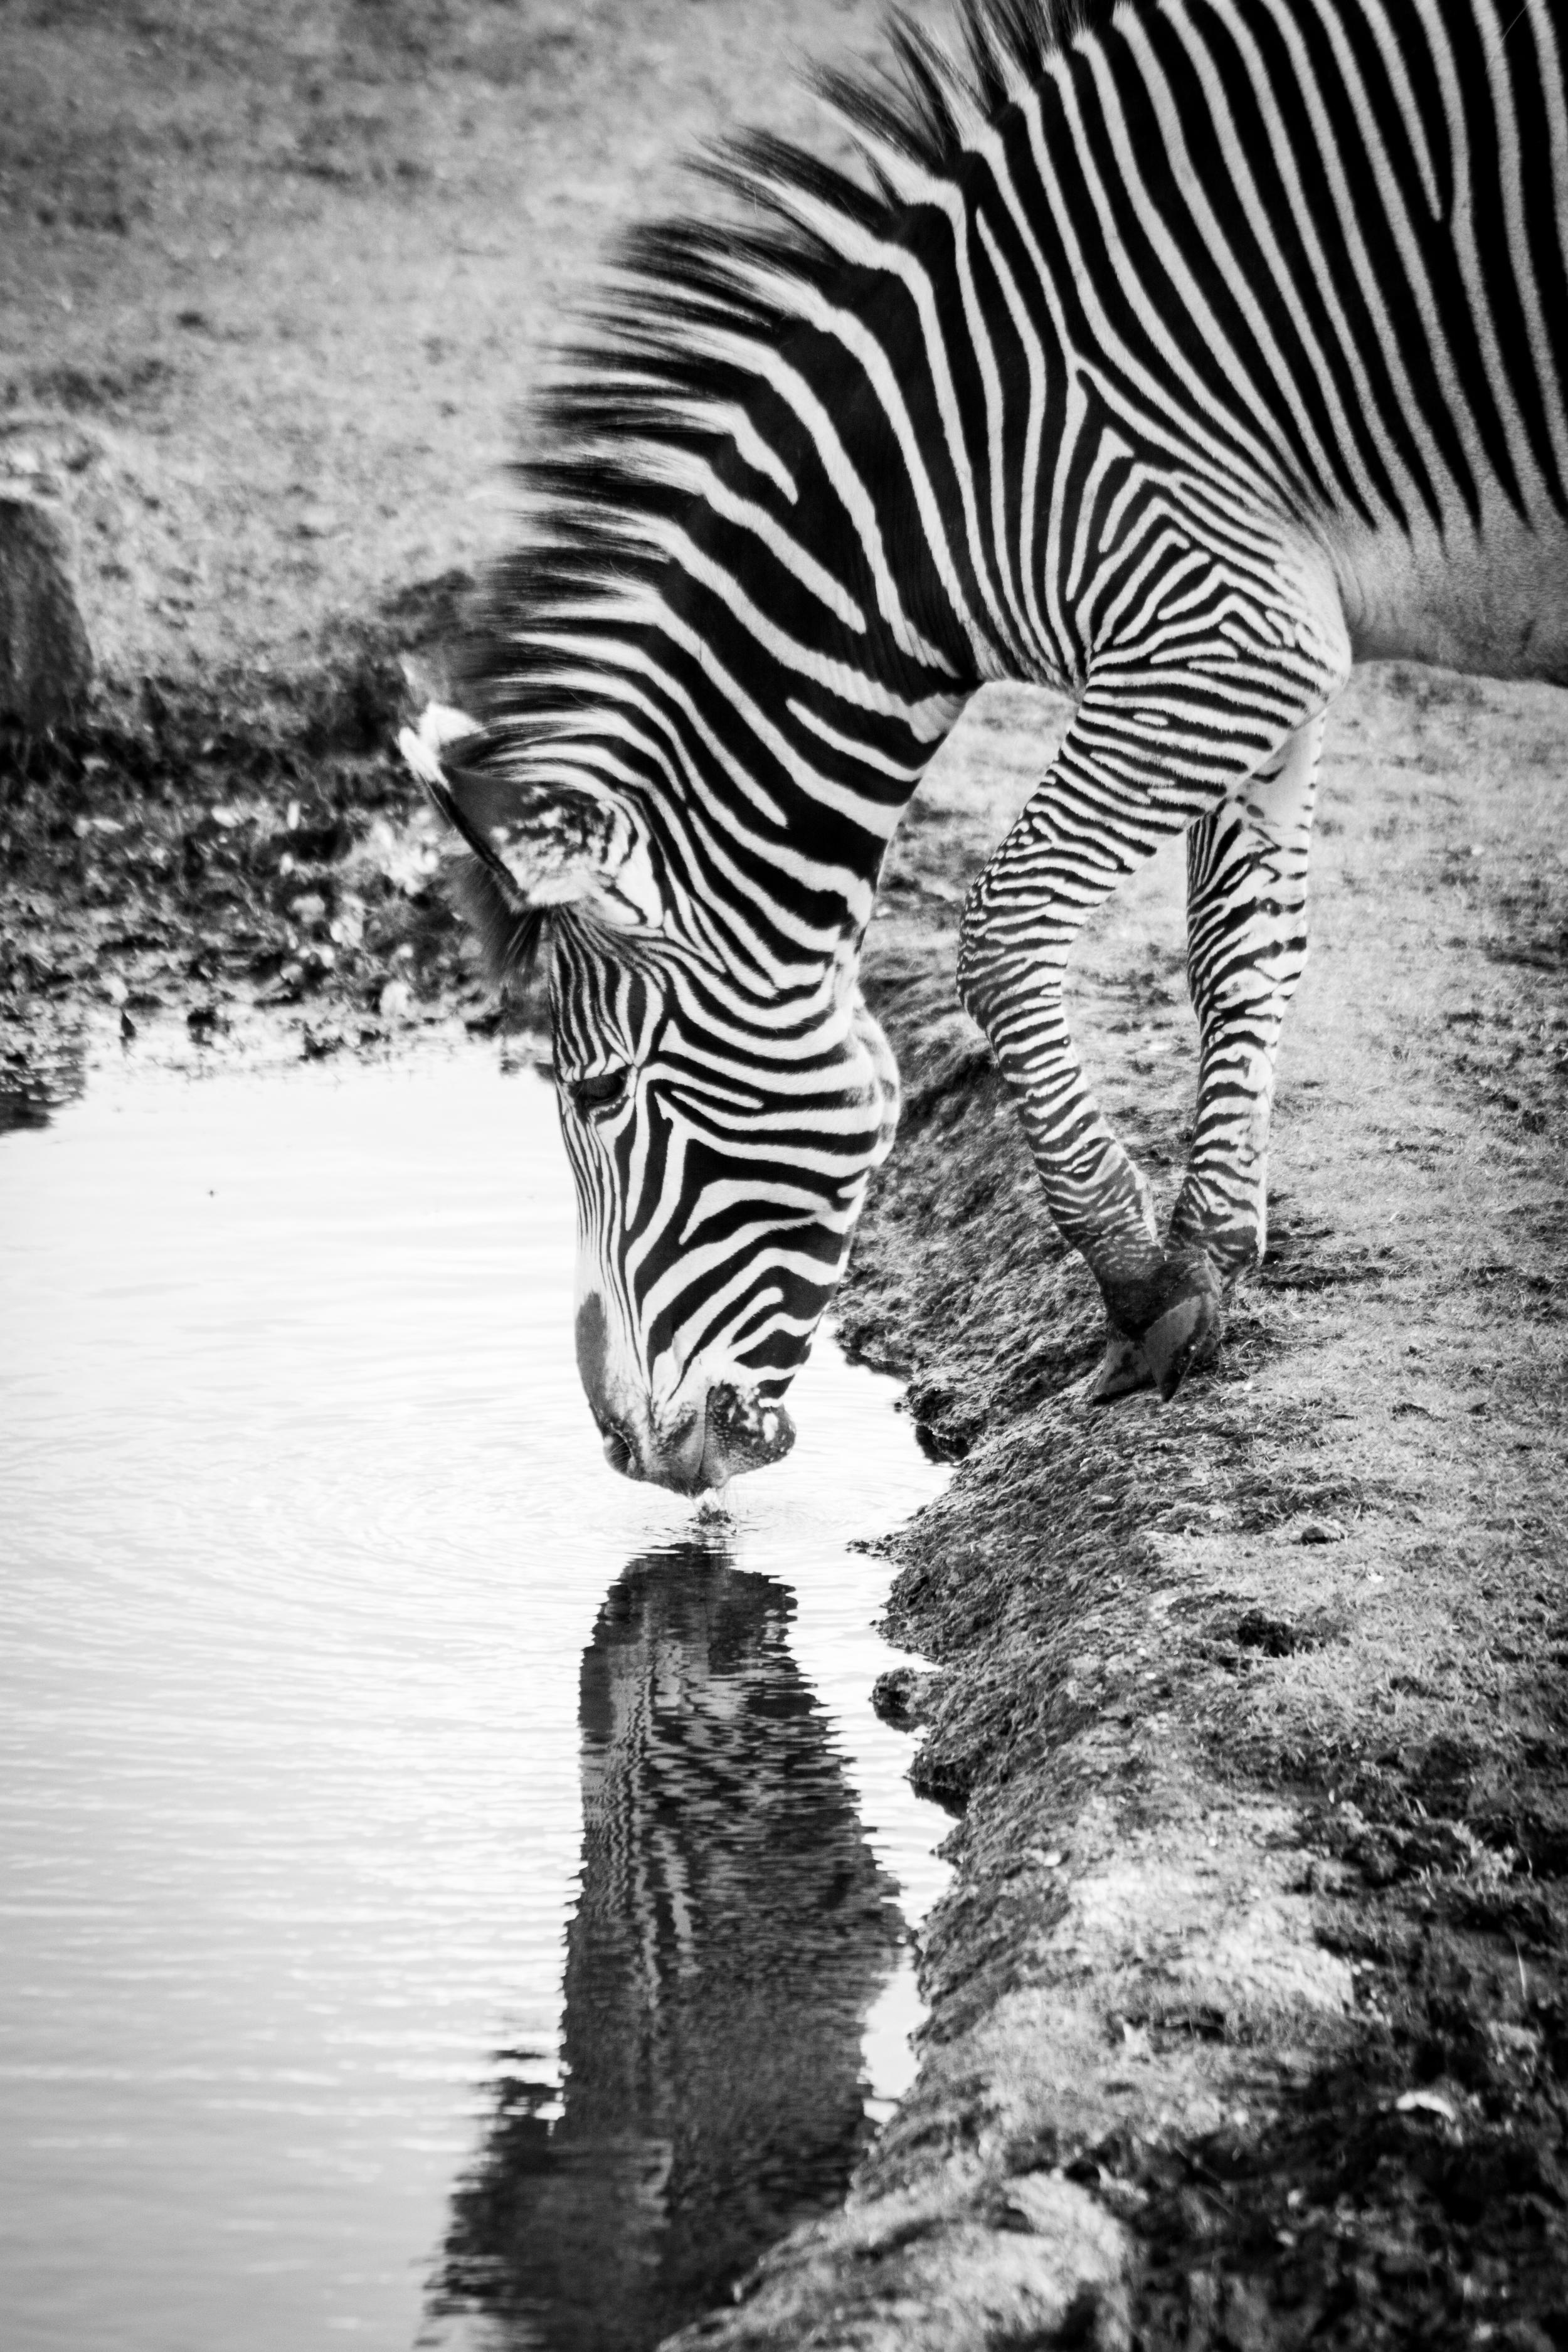 Zebra Reflection - Edinburgh Zoo - Sat 1 March 2014 -4183.jpg